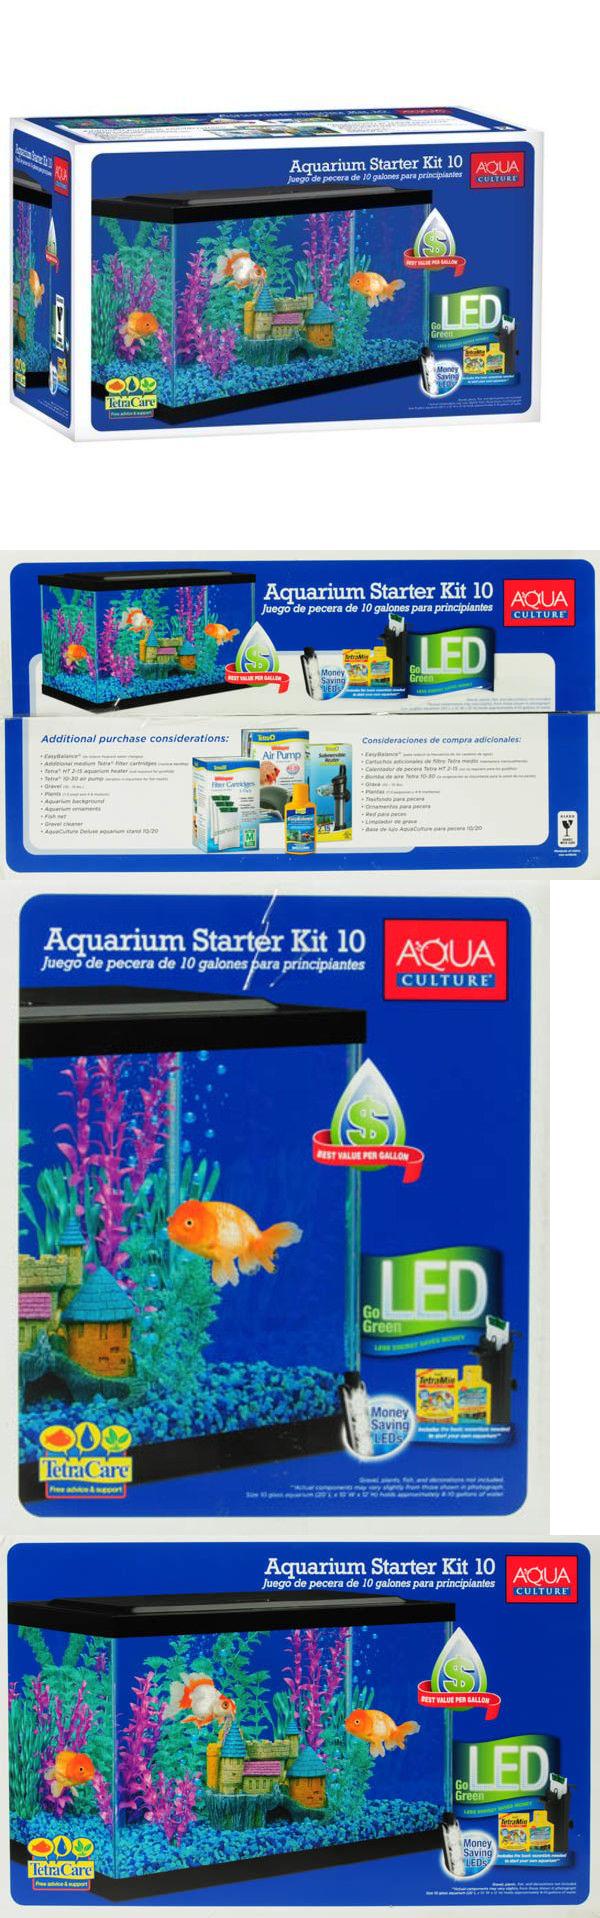 Aquarium fish tank hoods - Aquariums And Tanks 20755 Aquarium Kit 10 Gallon Fish Tank Aquarium Fish Tank Led Light